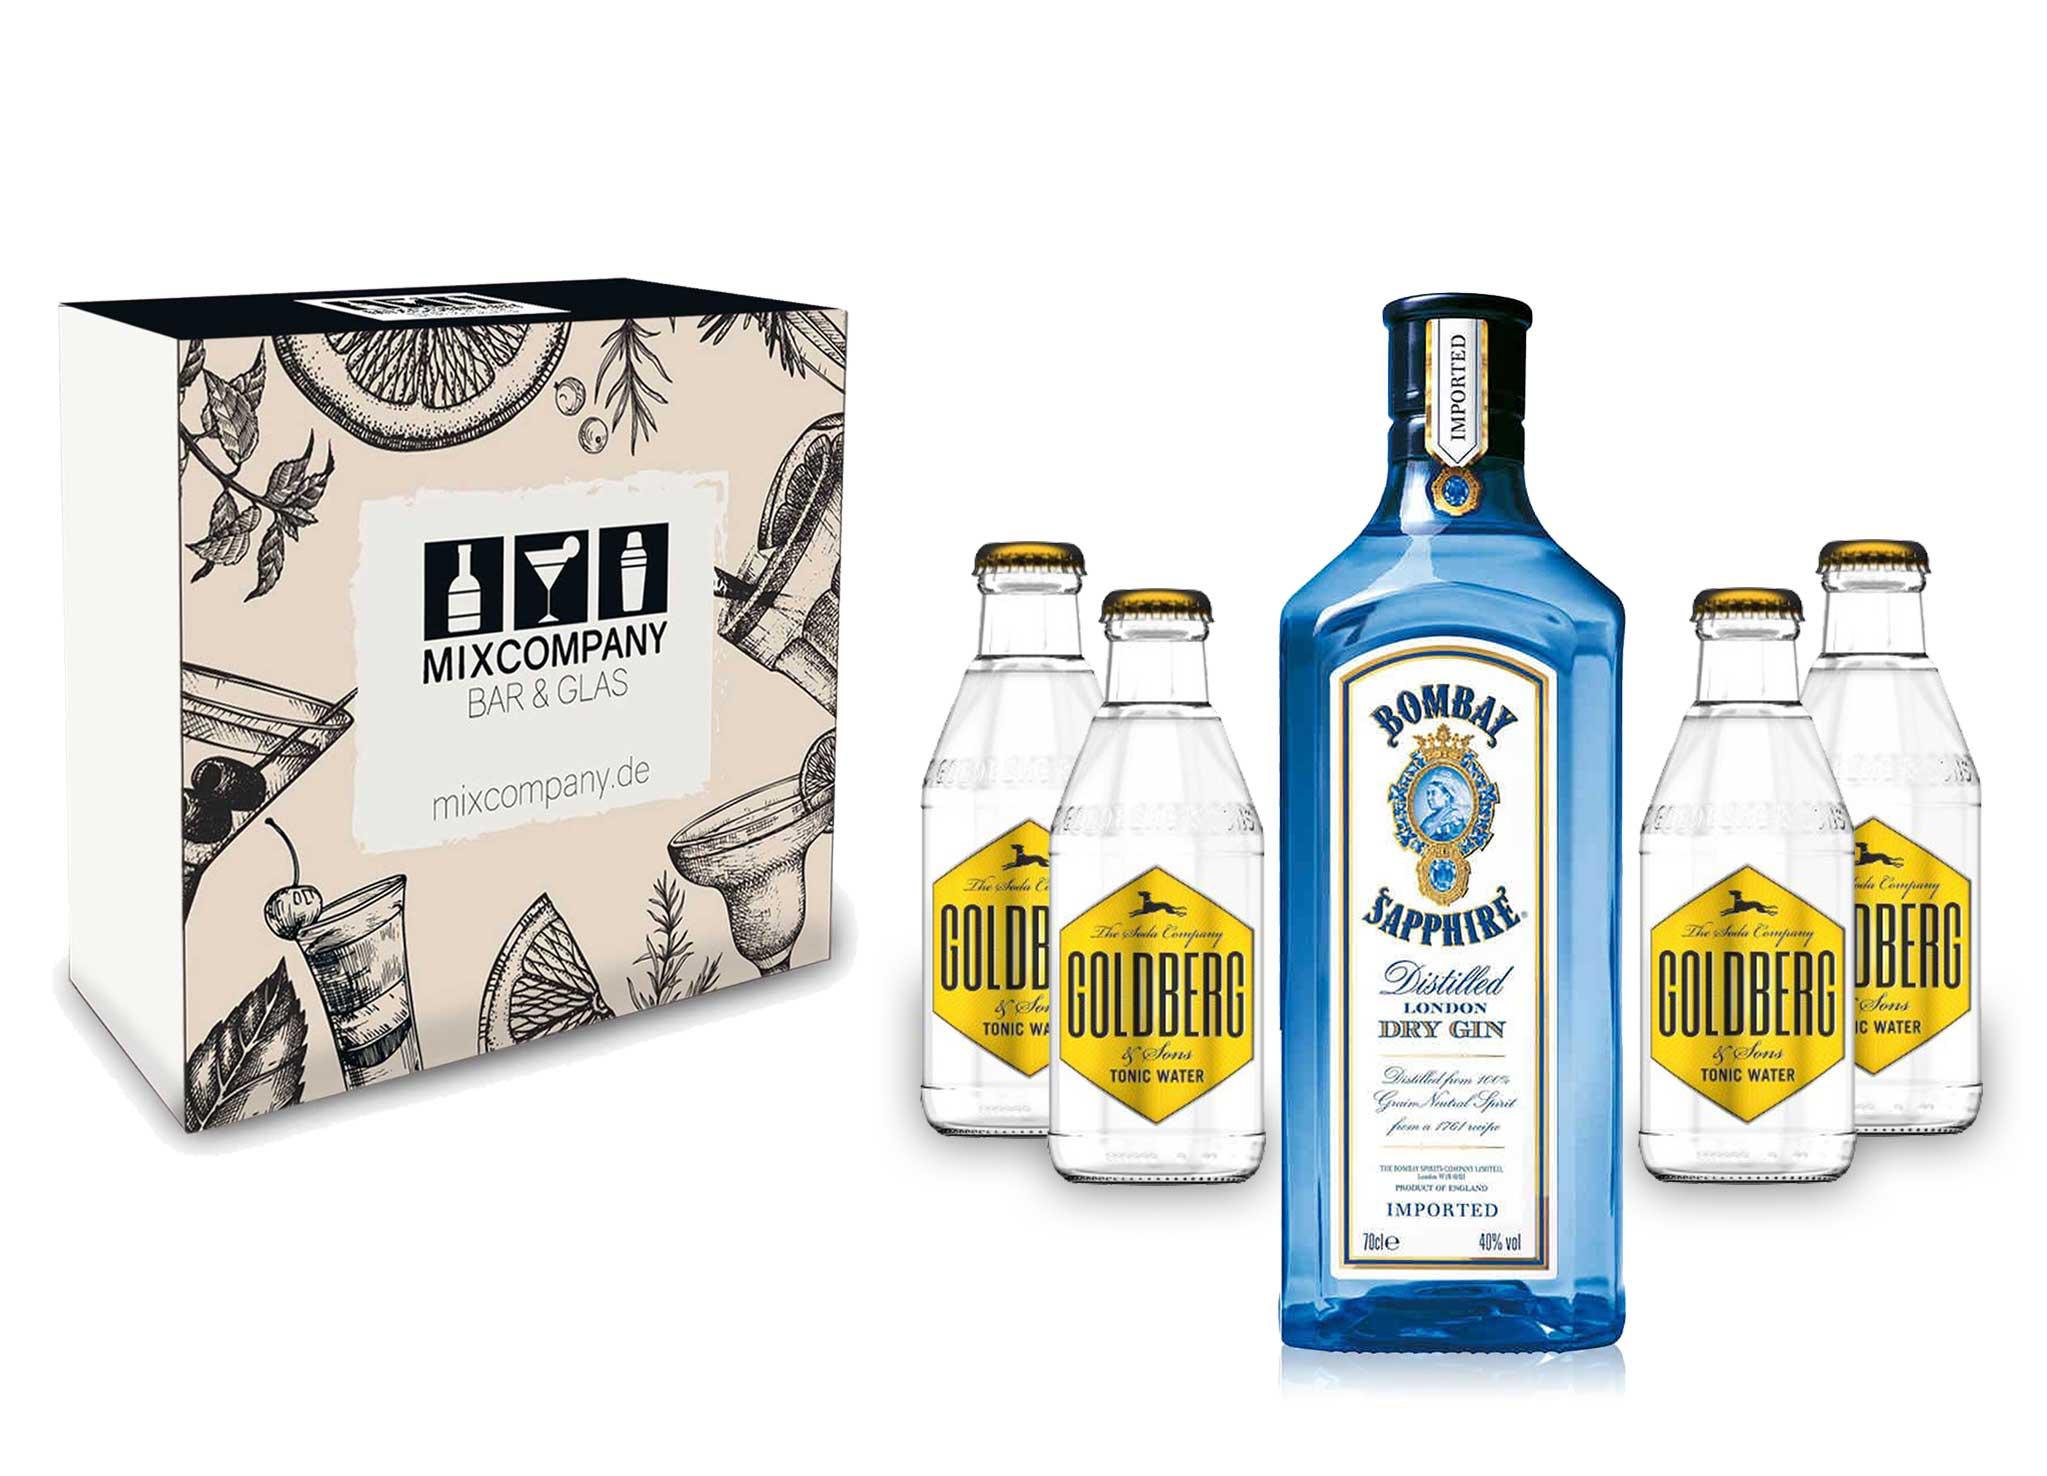 Gin Tonic Giftbox Geschenkset - Bombay Sapphire 0,7l 700ml (40% Vol) + 4x Goldberg Tonic Water 200ml inkl. Pfand MEHRWEG + Geschenkverpackung